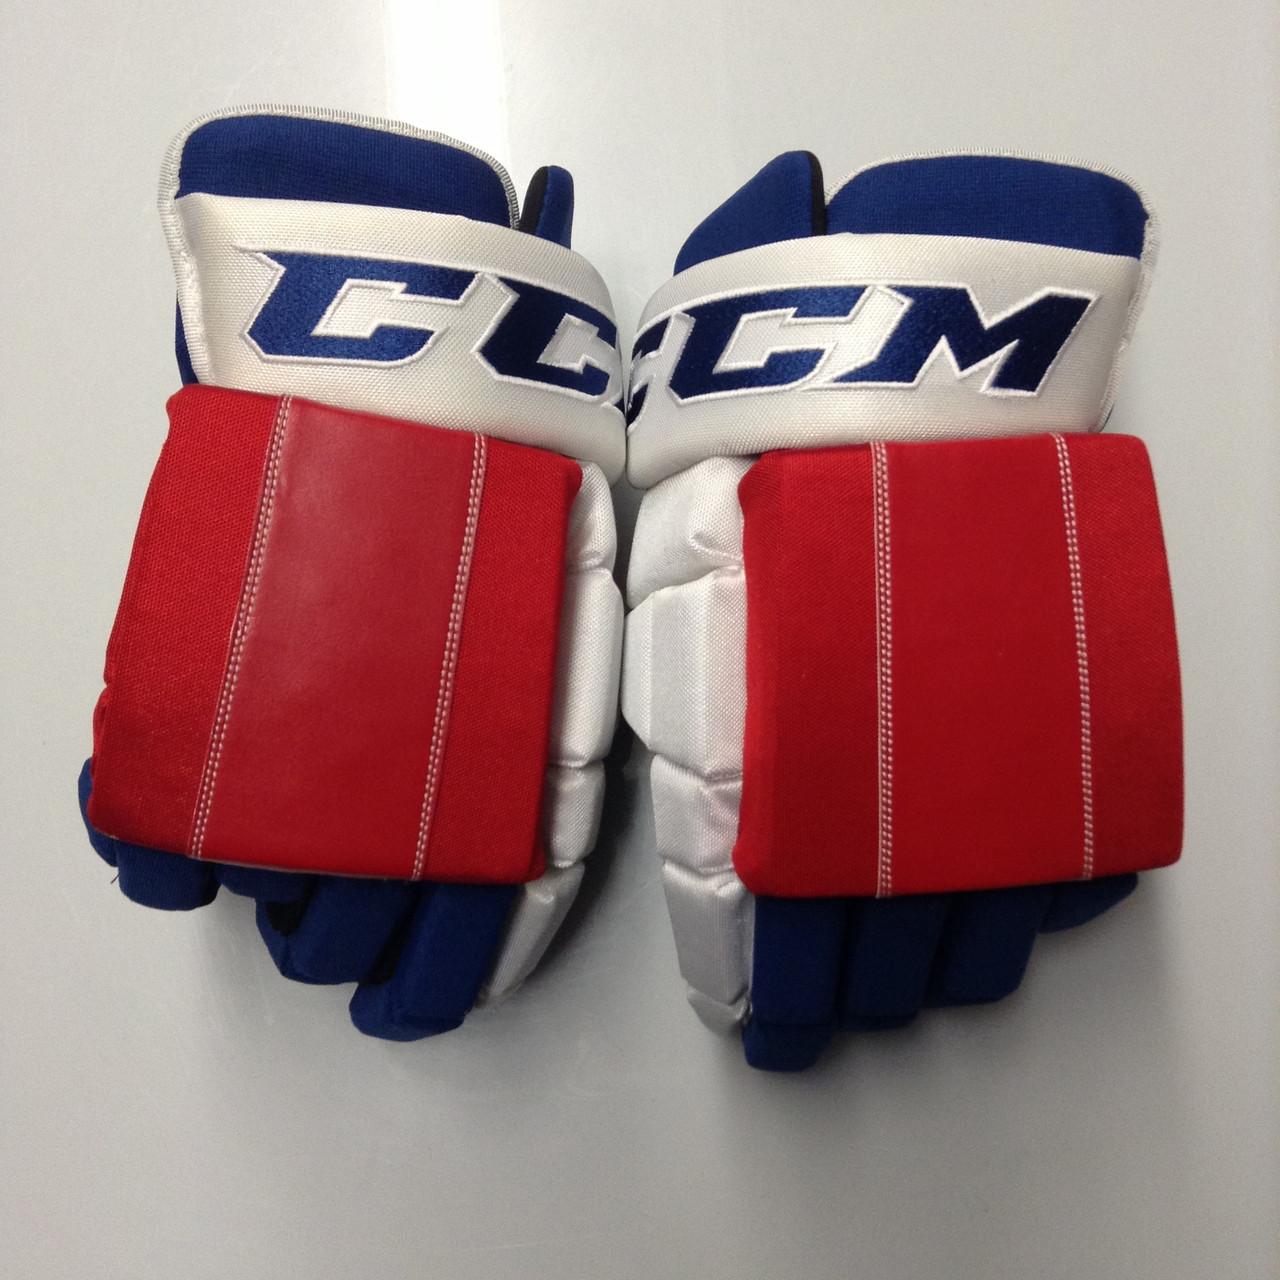 huge discount 339d9 b935f CCM HG4RPP Pro Stock Custom Hockey Gloves 15